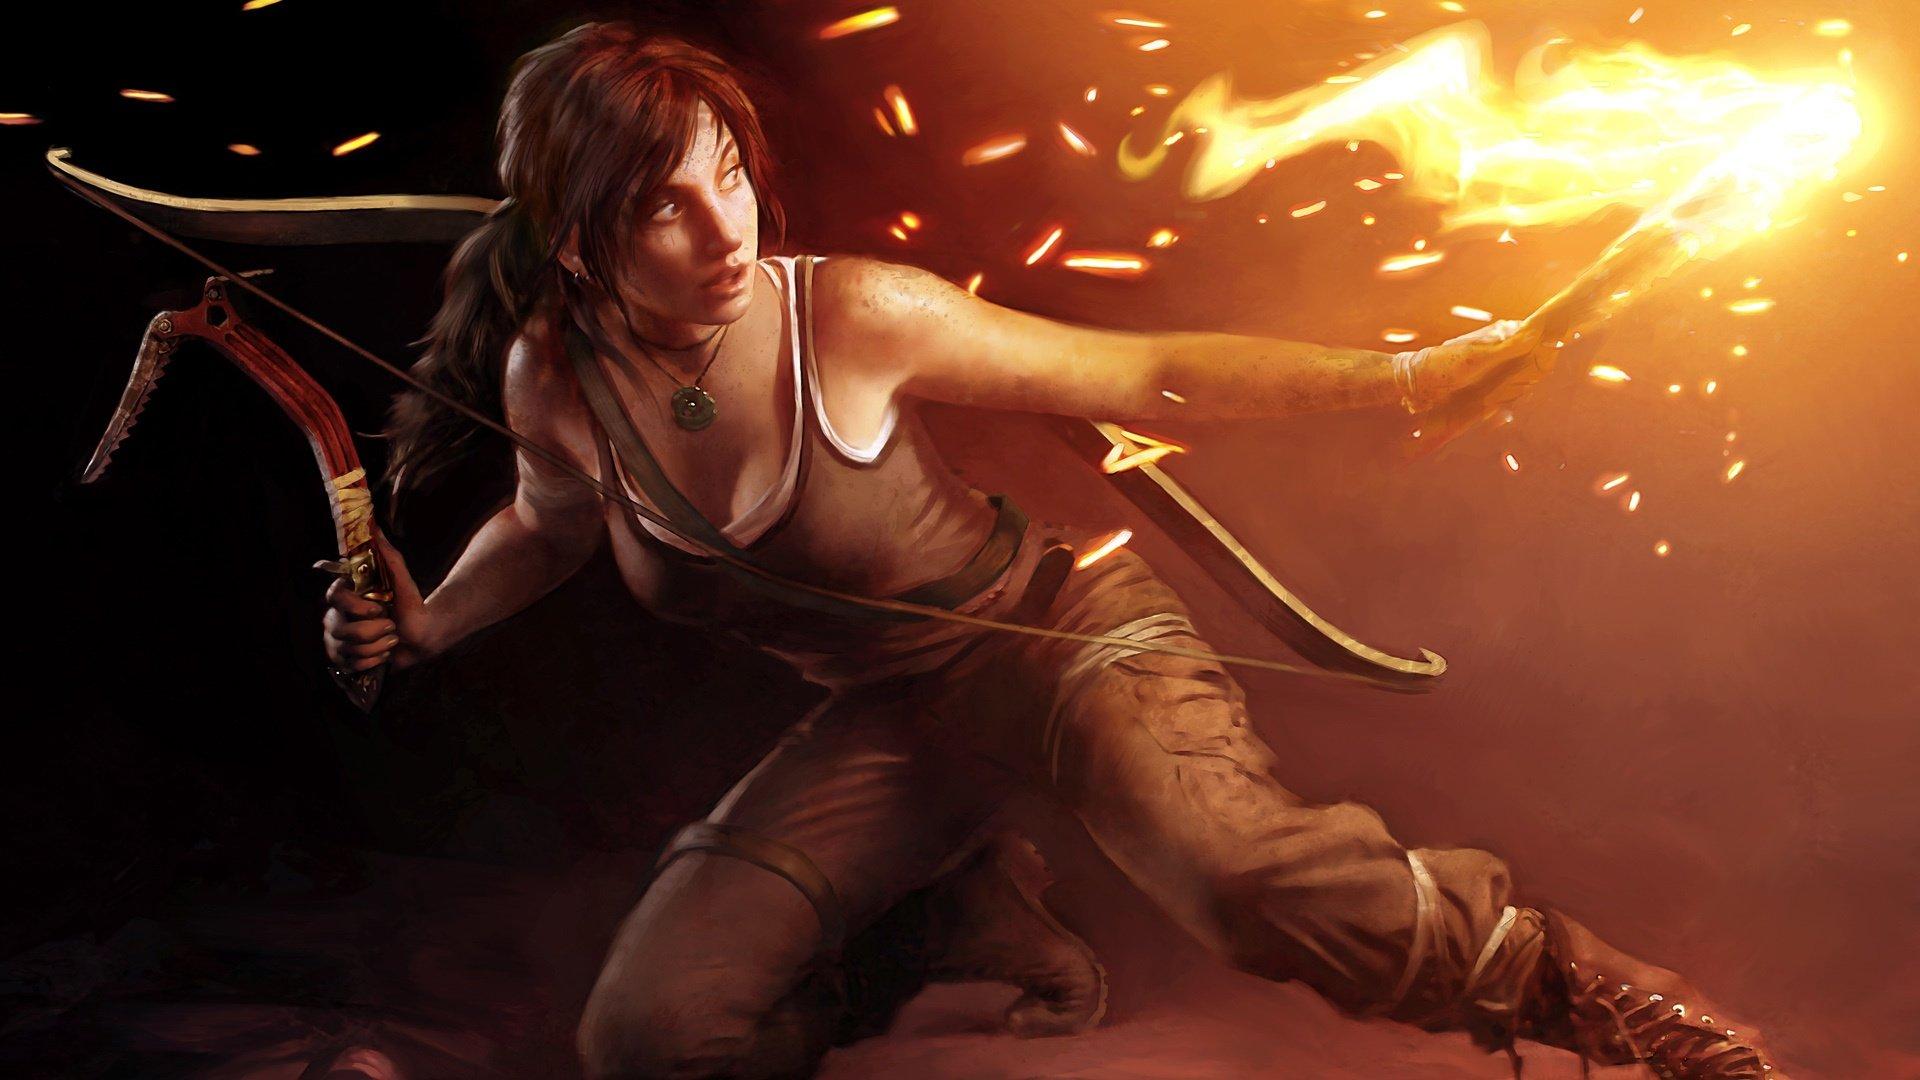 Tomb Raider 4K Wallpaper